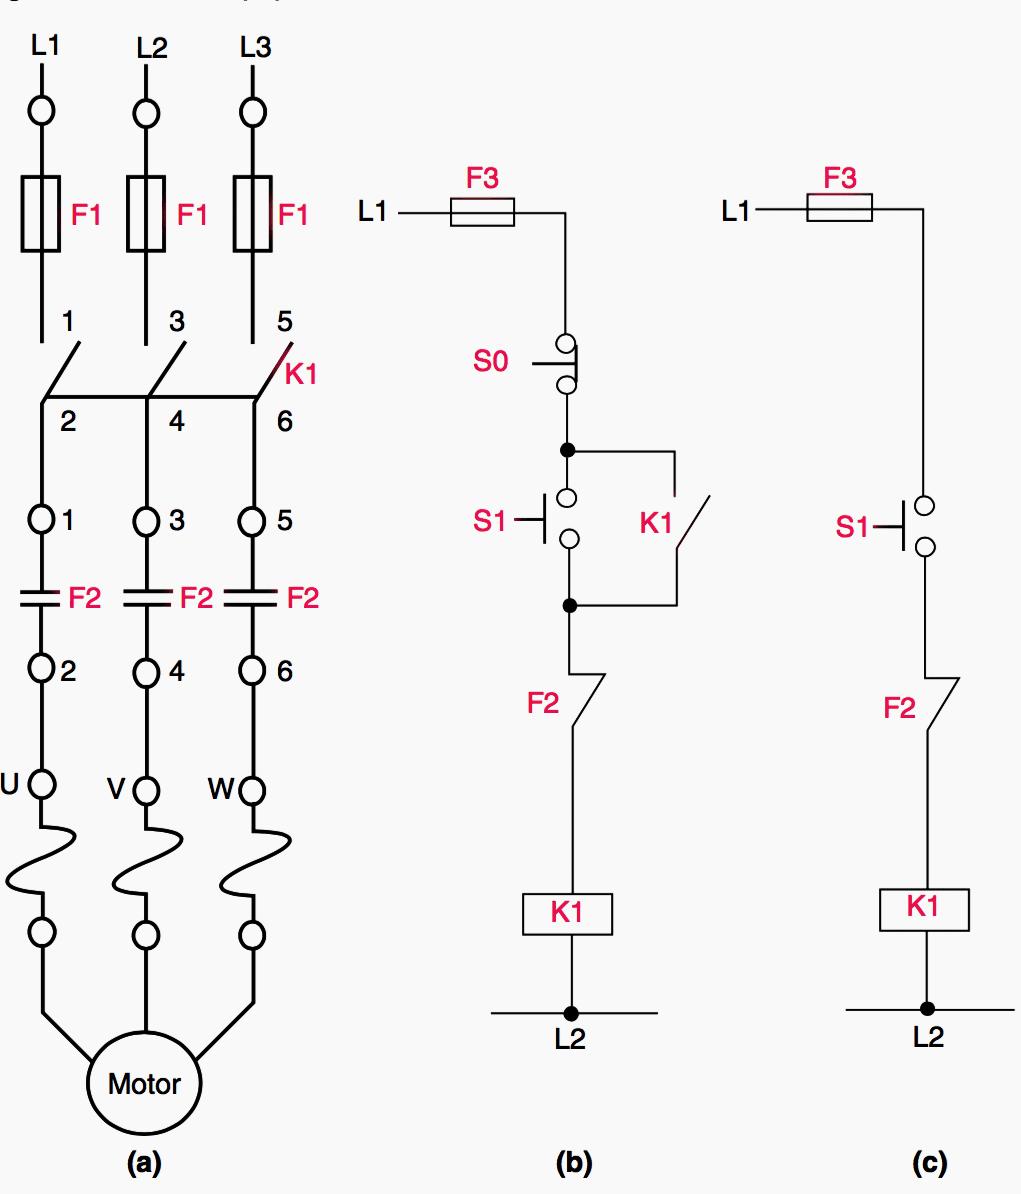 Dol Starter Motor Wiring Diagram Schematic Diagrams Crompton Control For Data U2022 Lamp